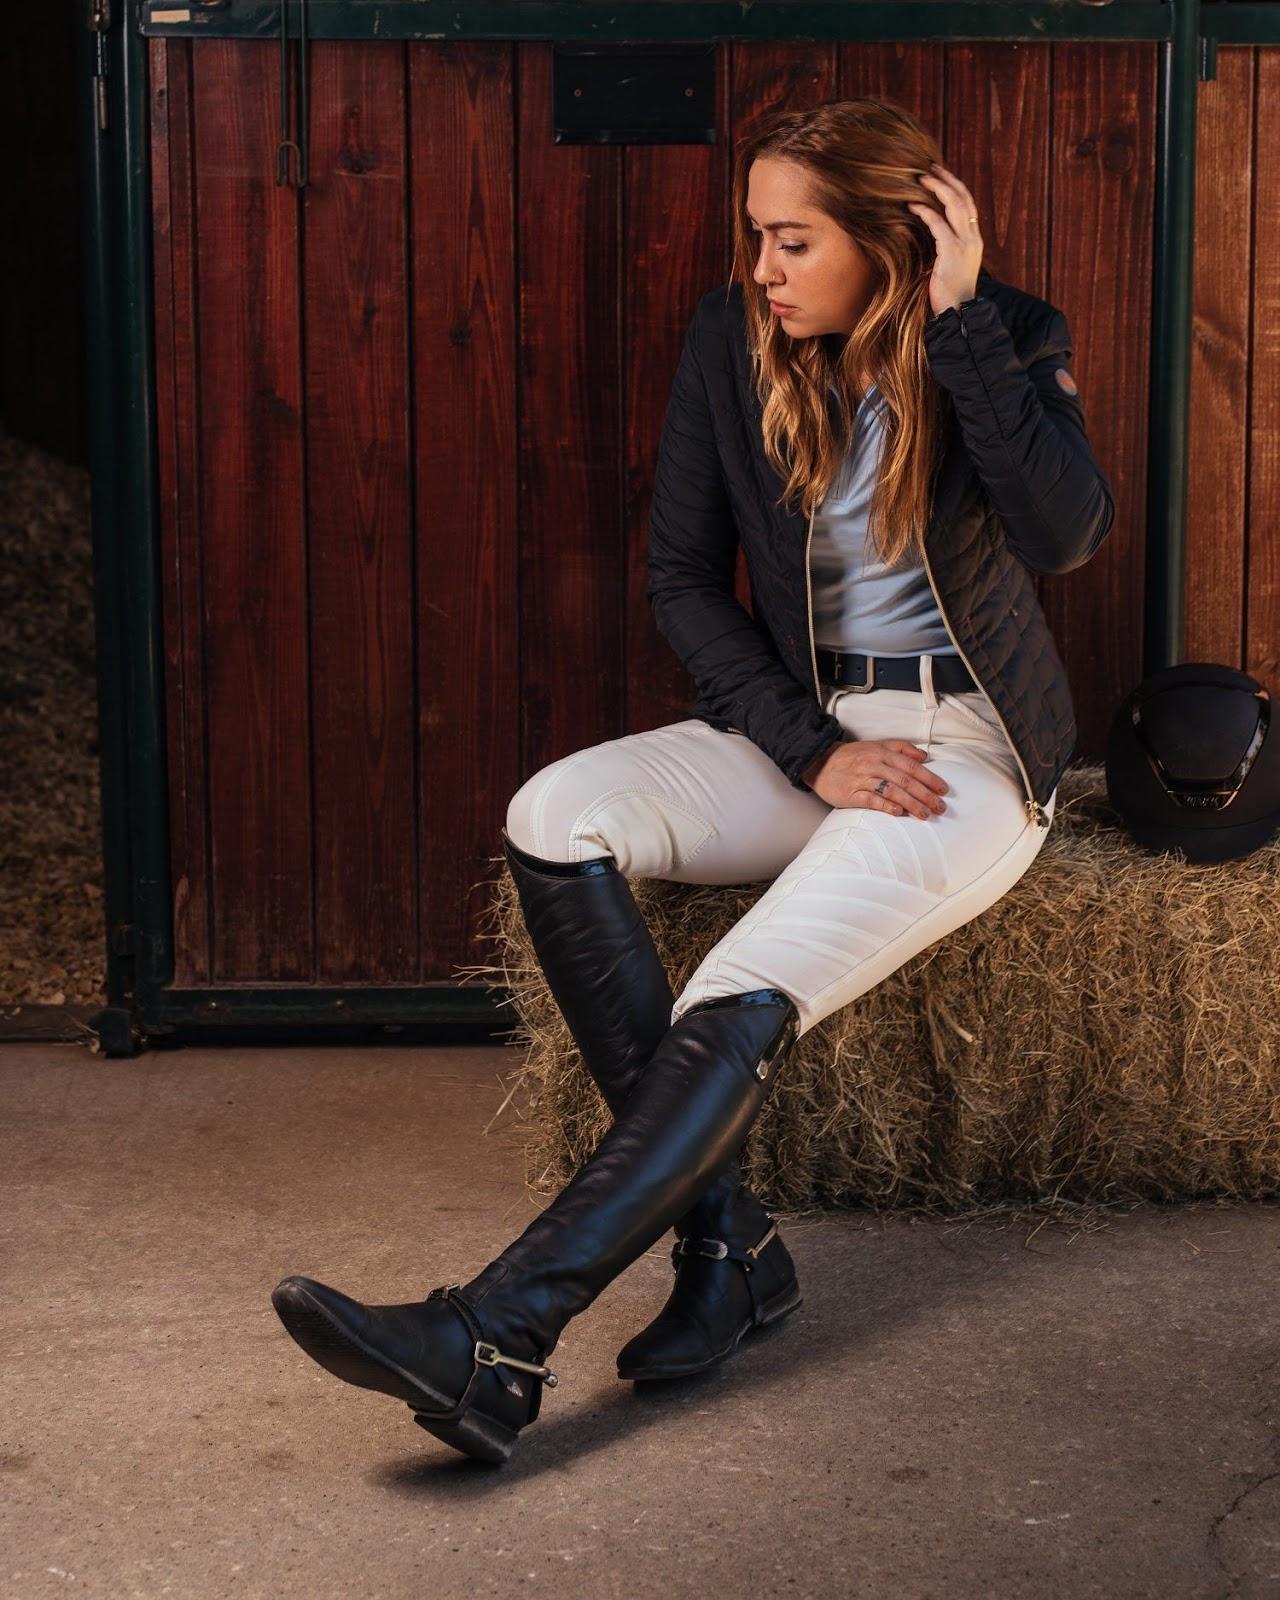 women wearing riding boots